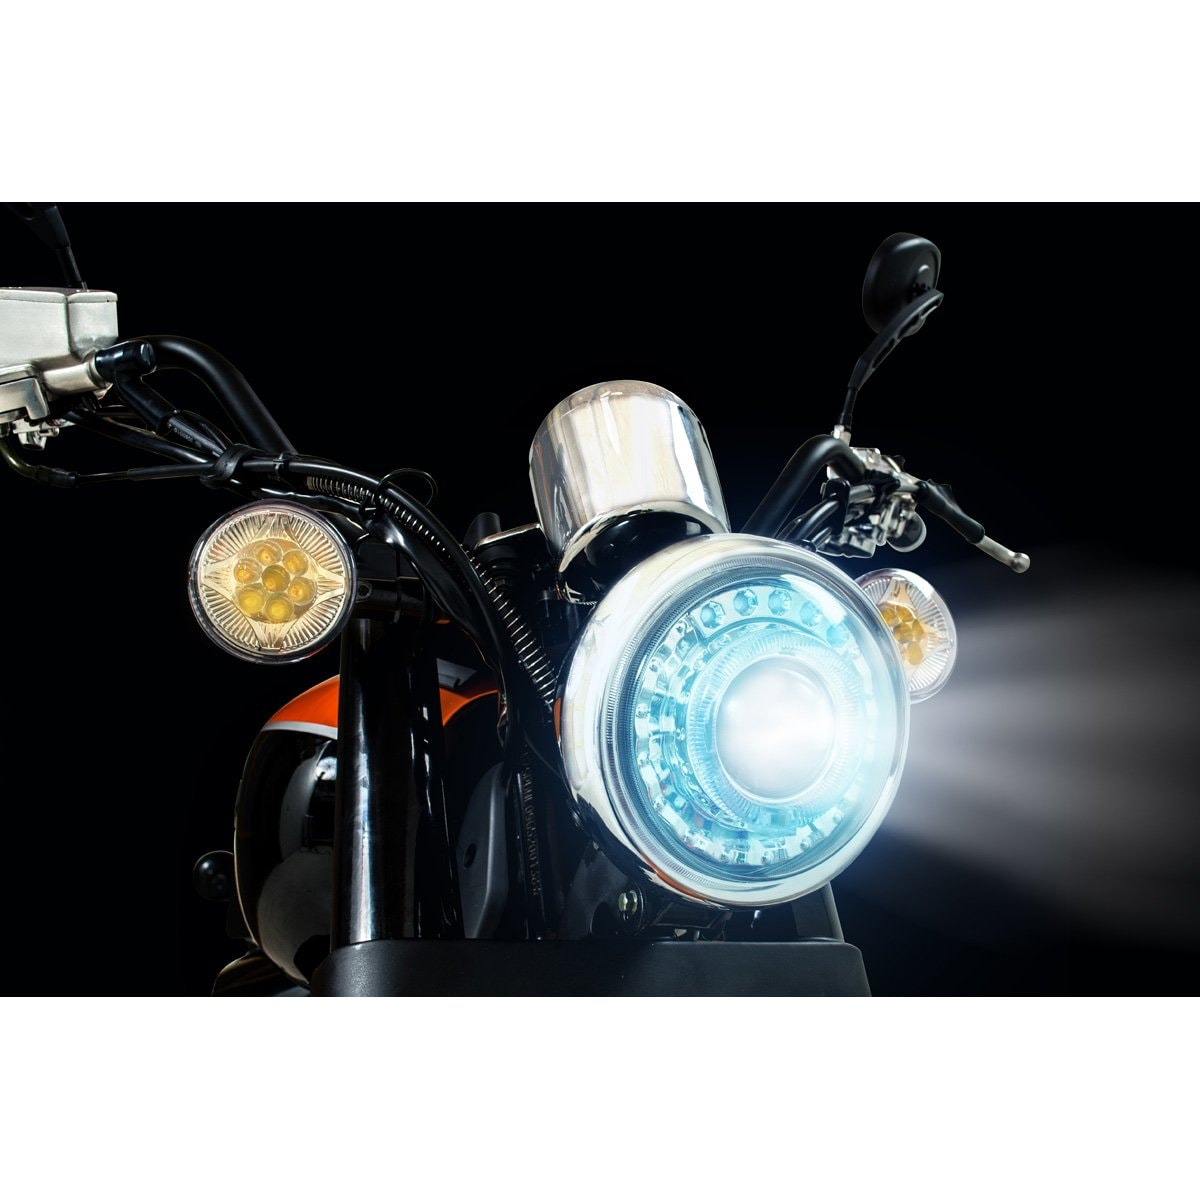 Motocicleta Estándar Black Devil 250 Cc Mb